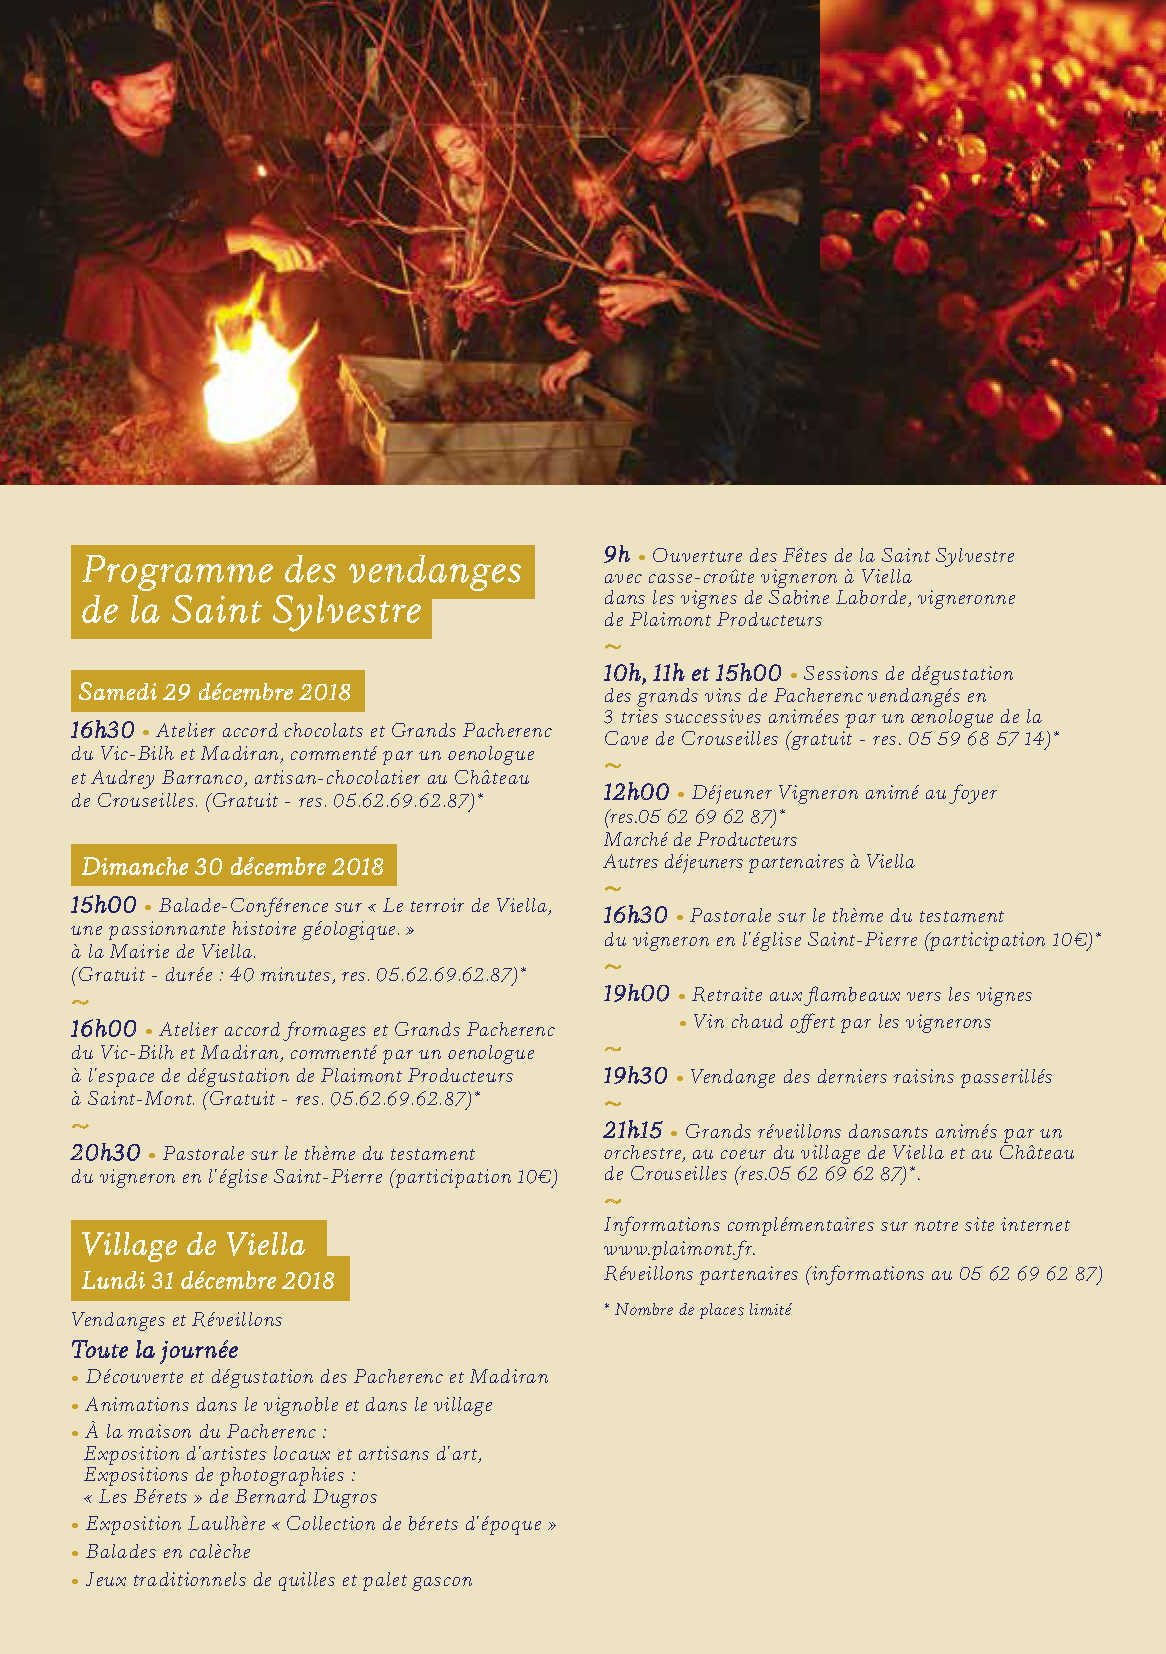 Programme-St-Sylvestre-2018.png